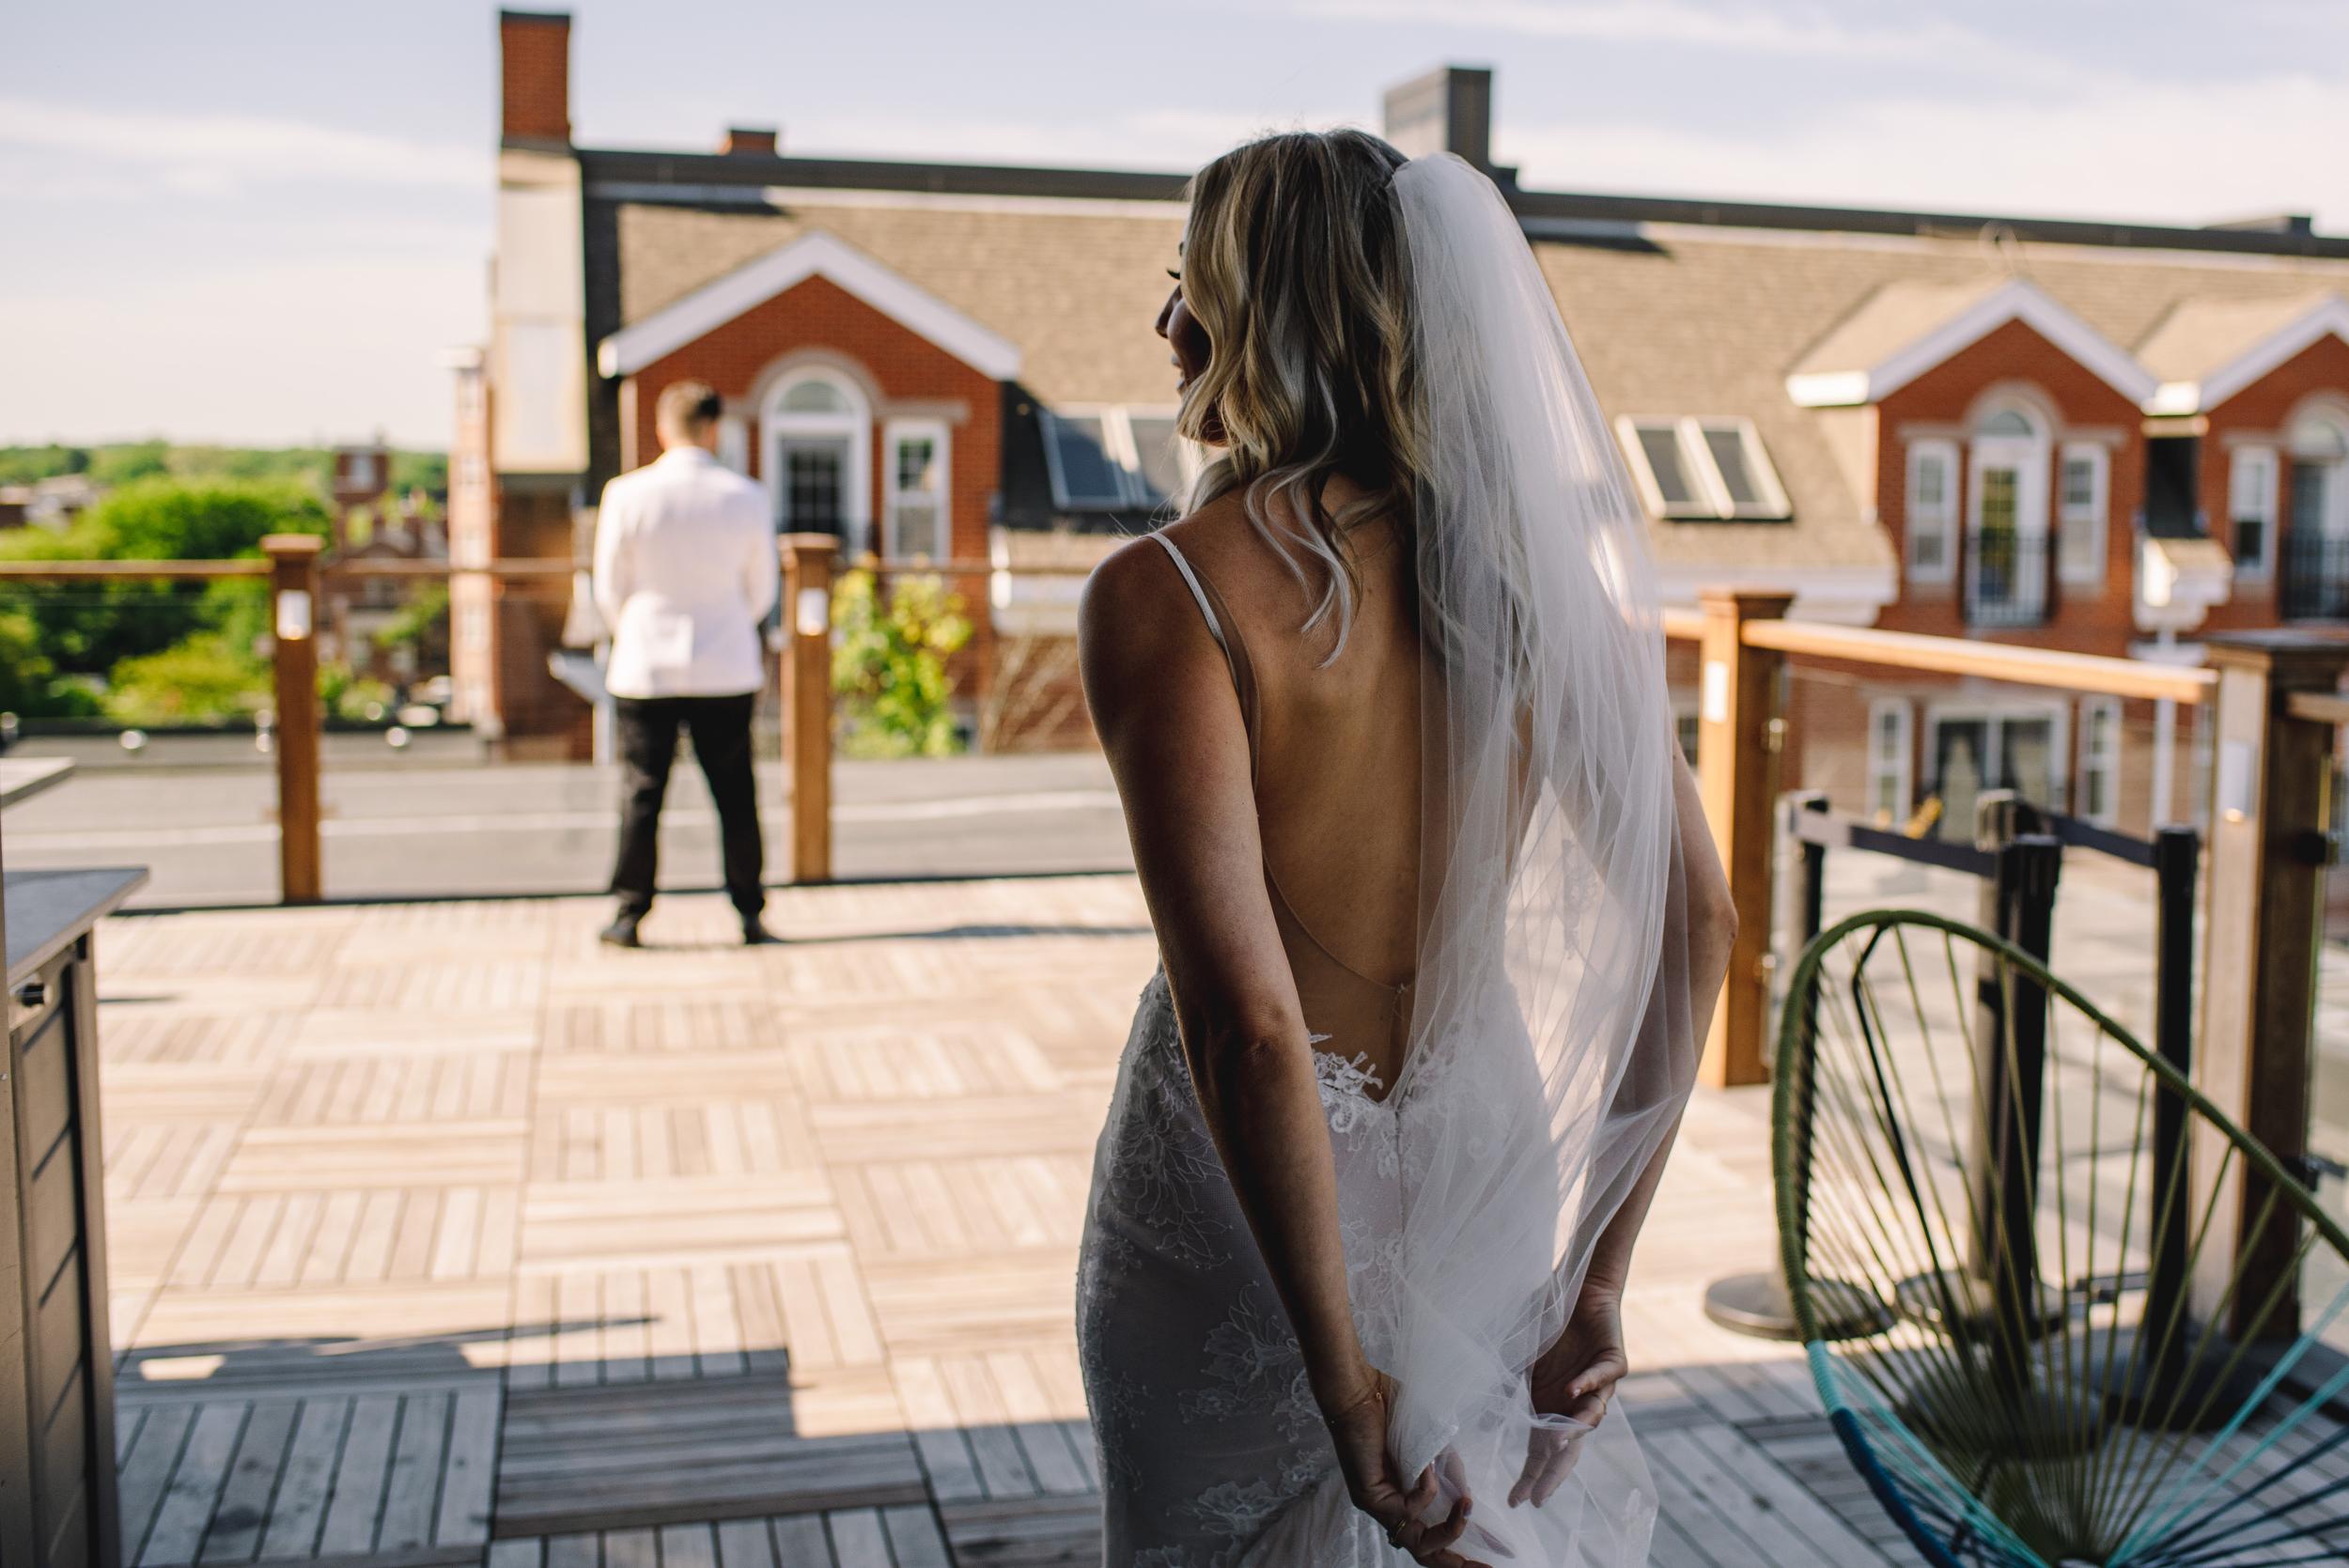 the_hotel_salem_wedding_mikhail_glabets_10.JPG